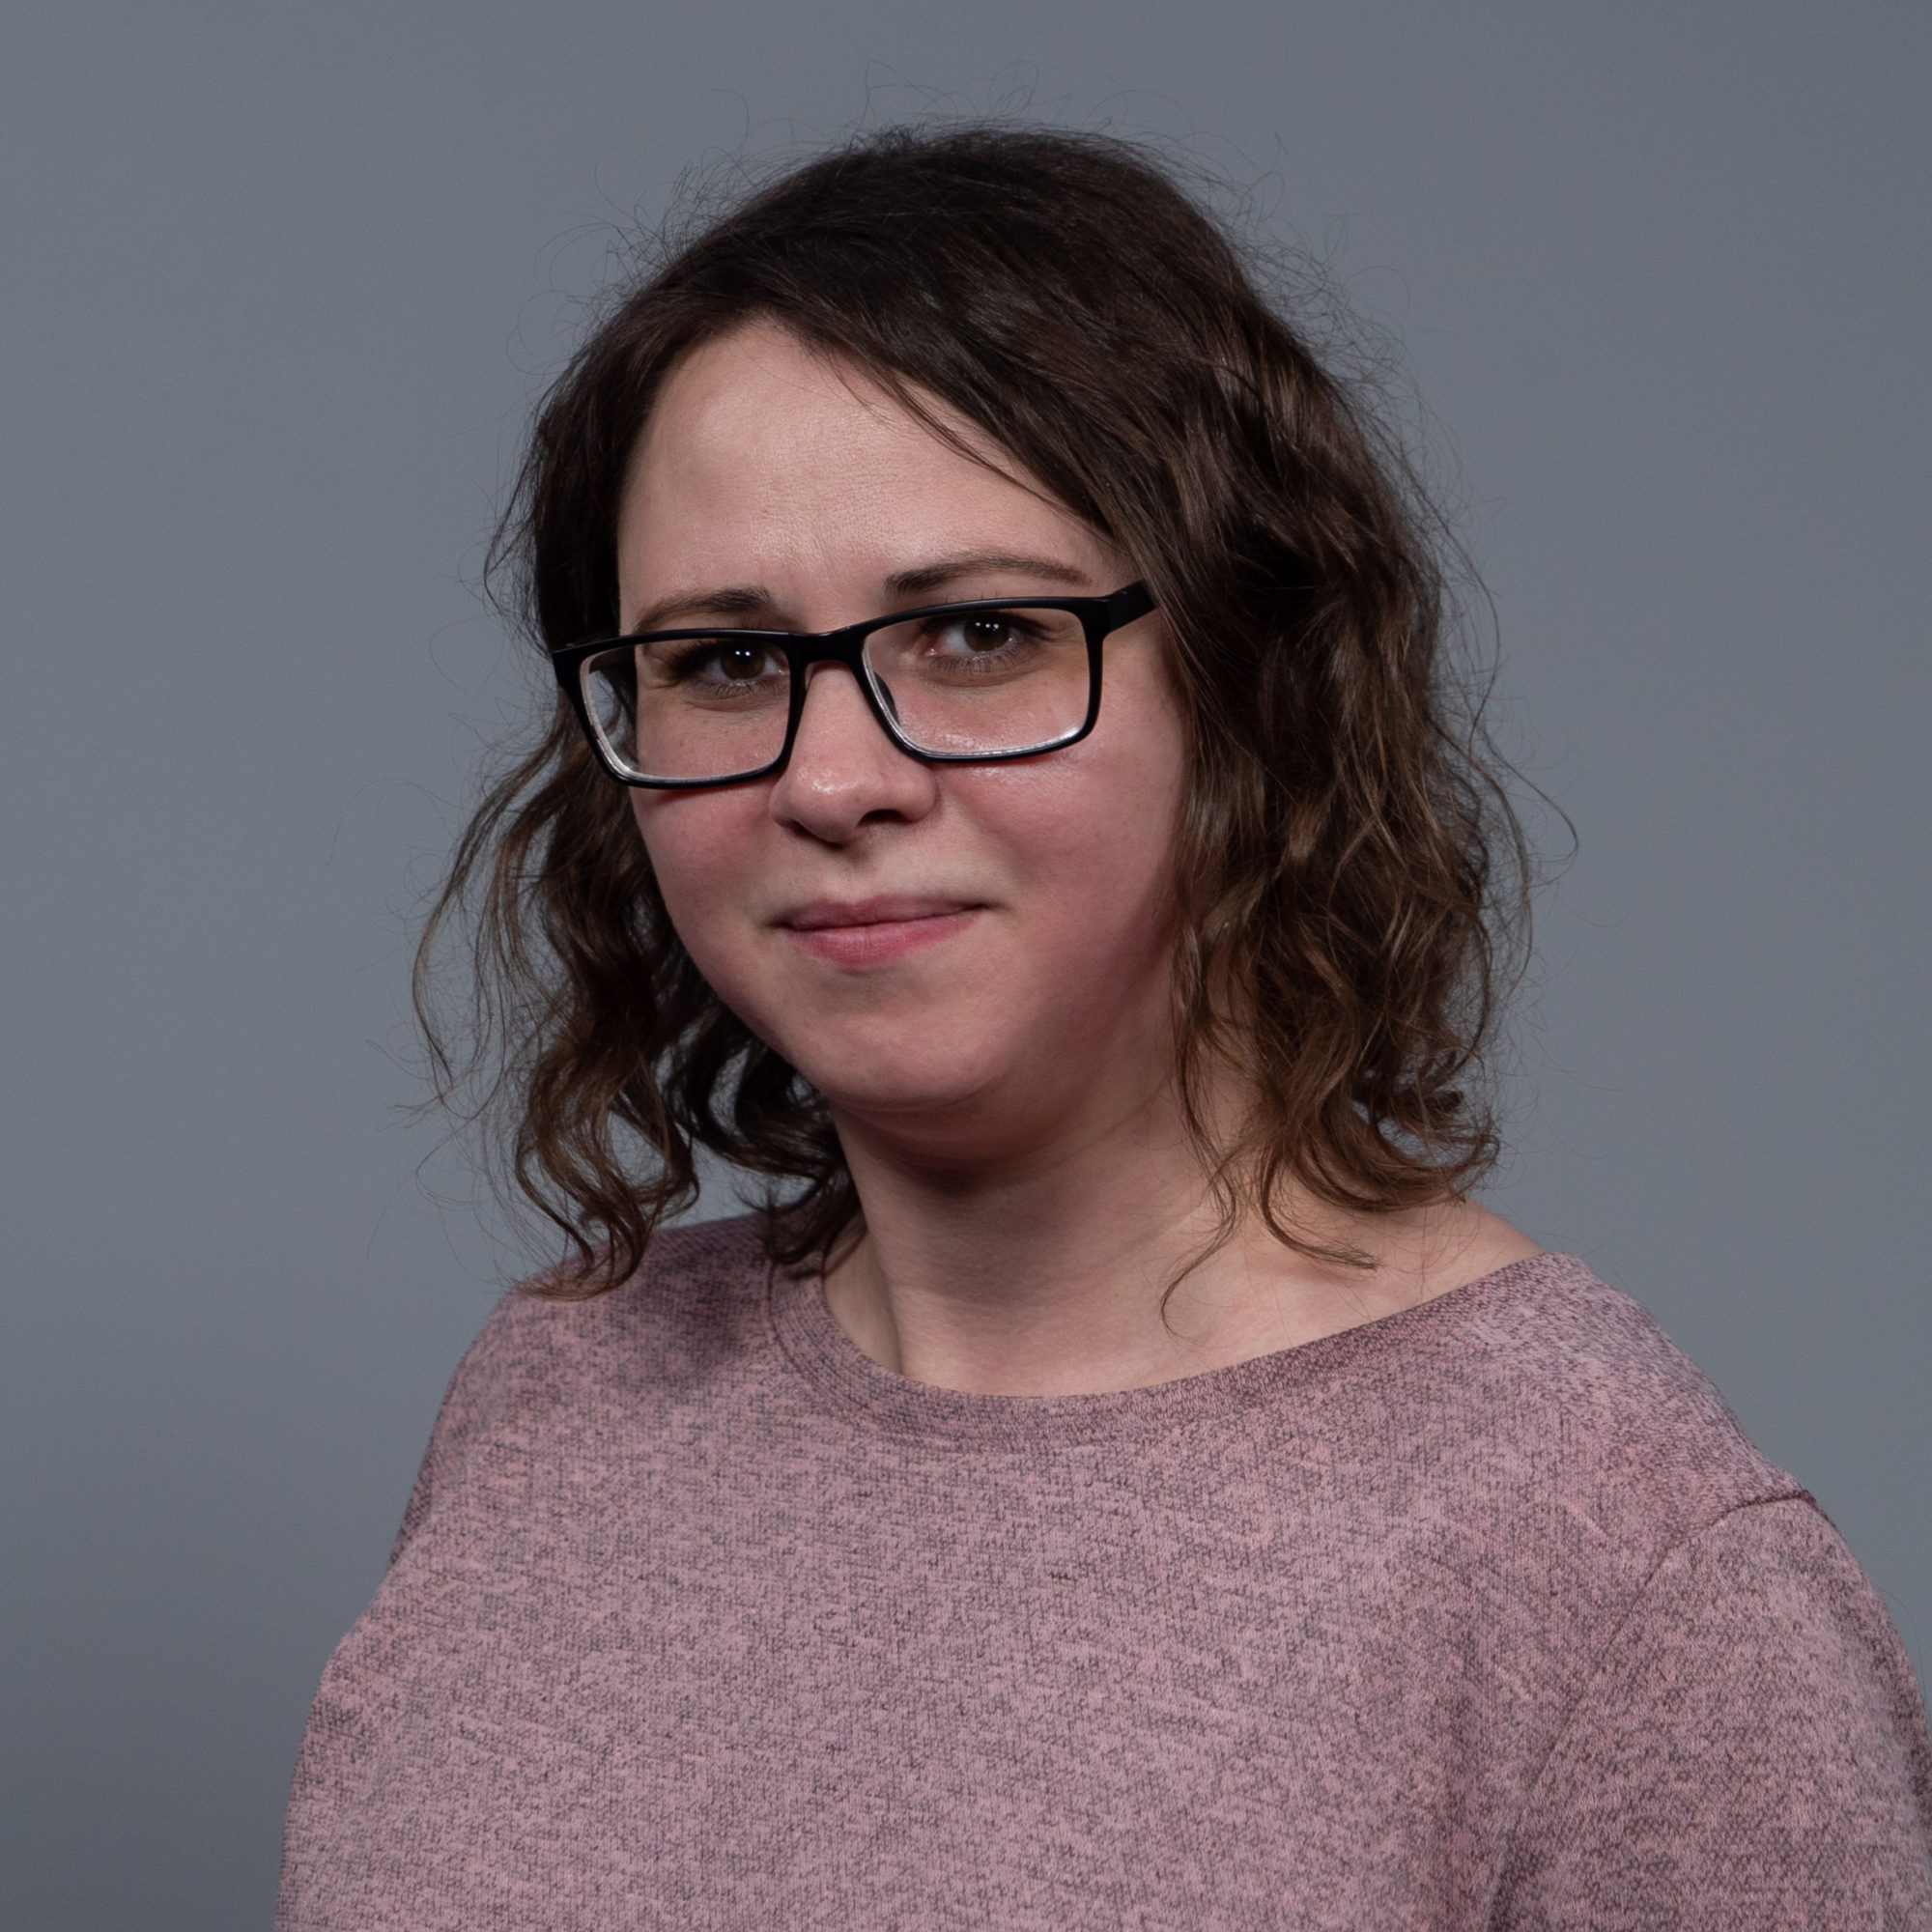 Tatiana Doroshenko